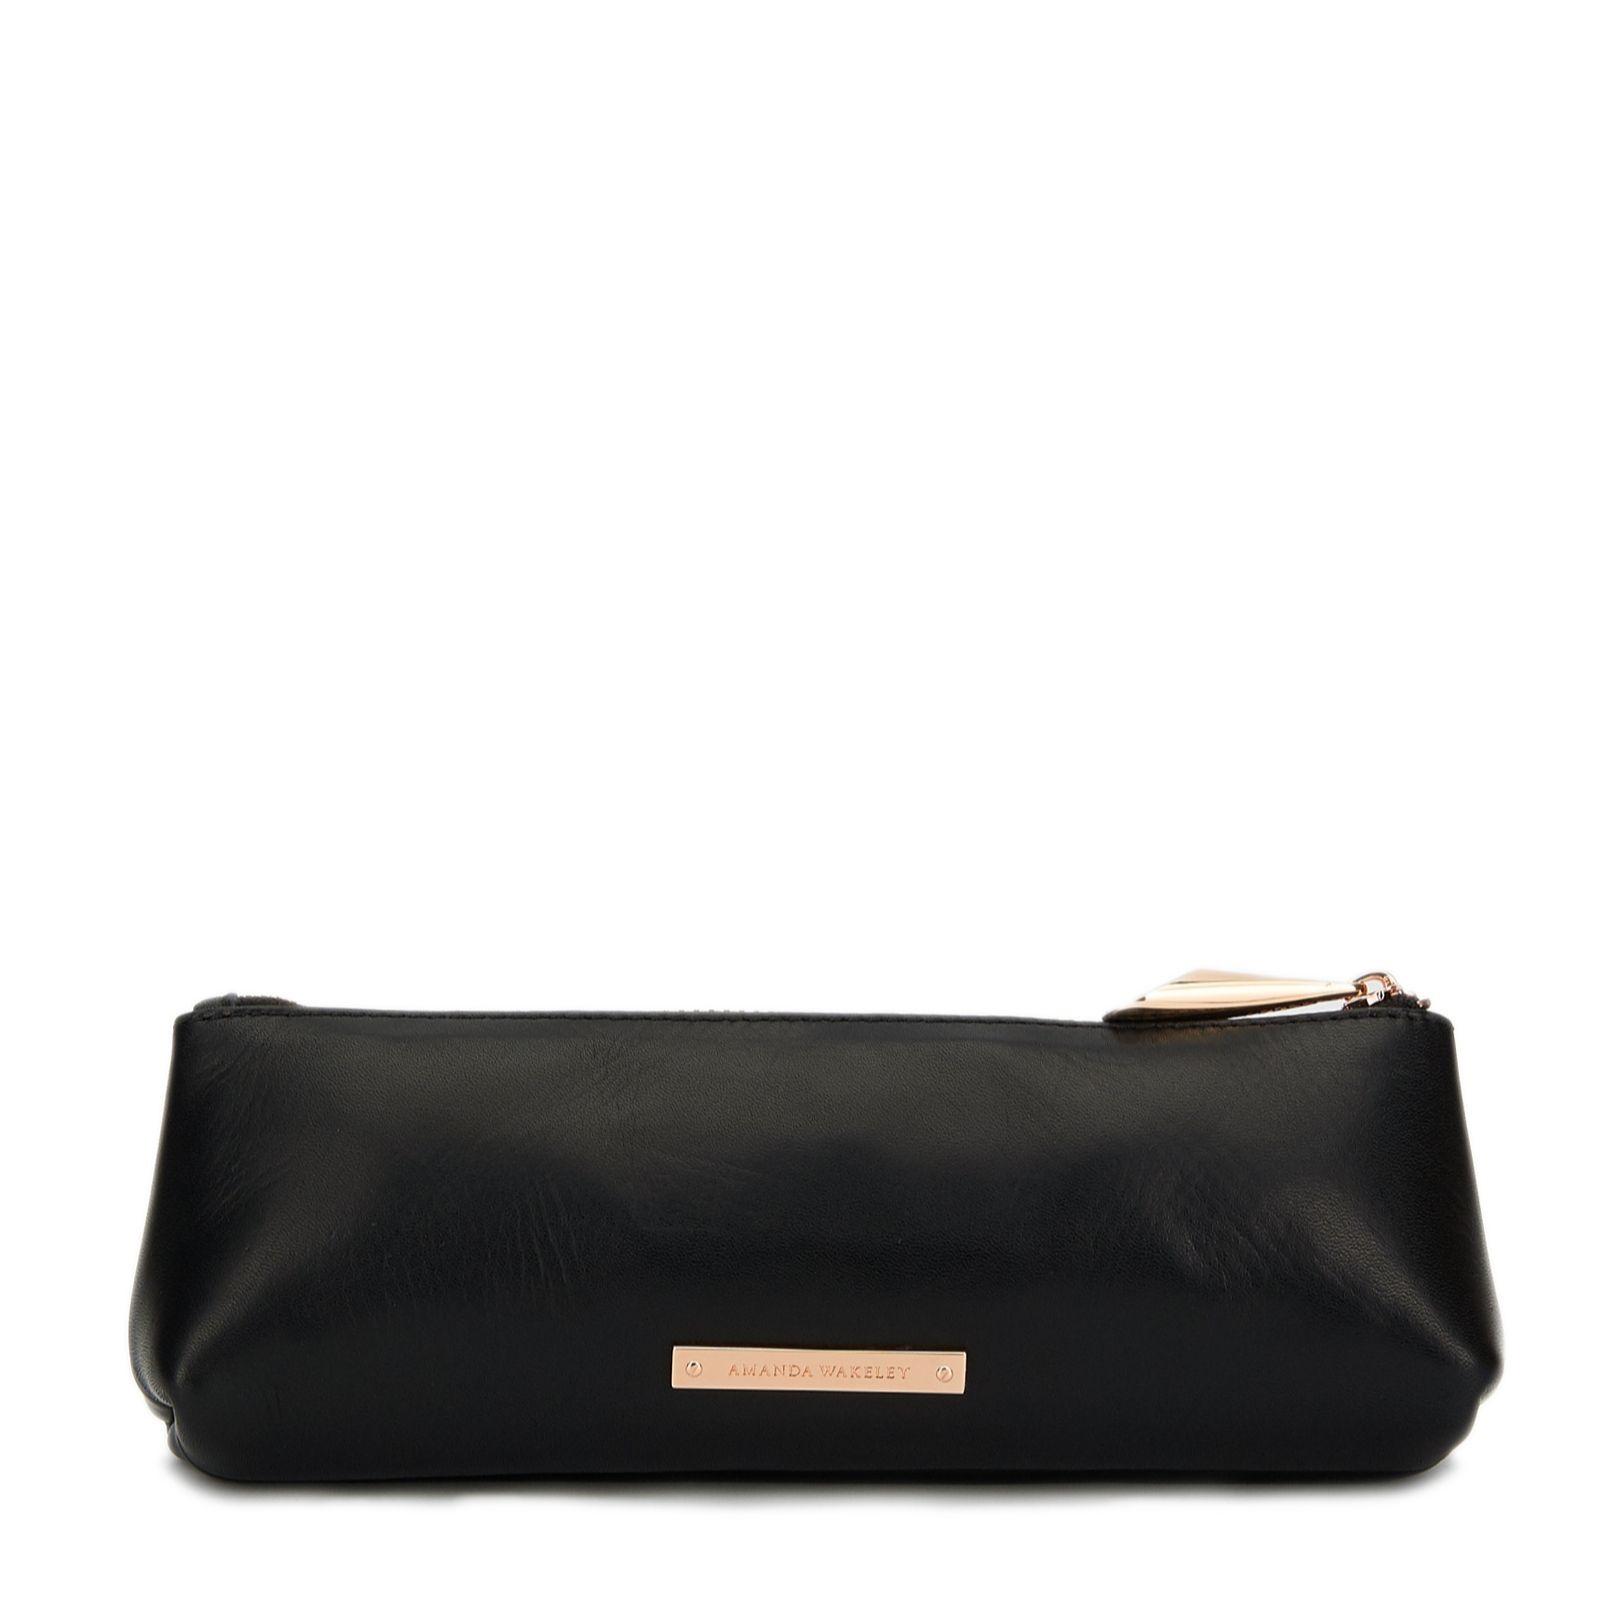 Amanda Wakeley The Mercury Medium Leather Metallic Cosmetics Bag - Page 1 -  QVC UK 53c1b7147d6d6